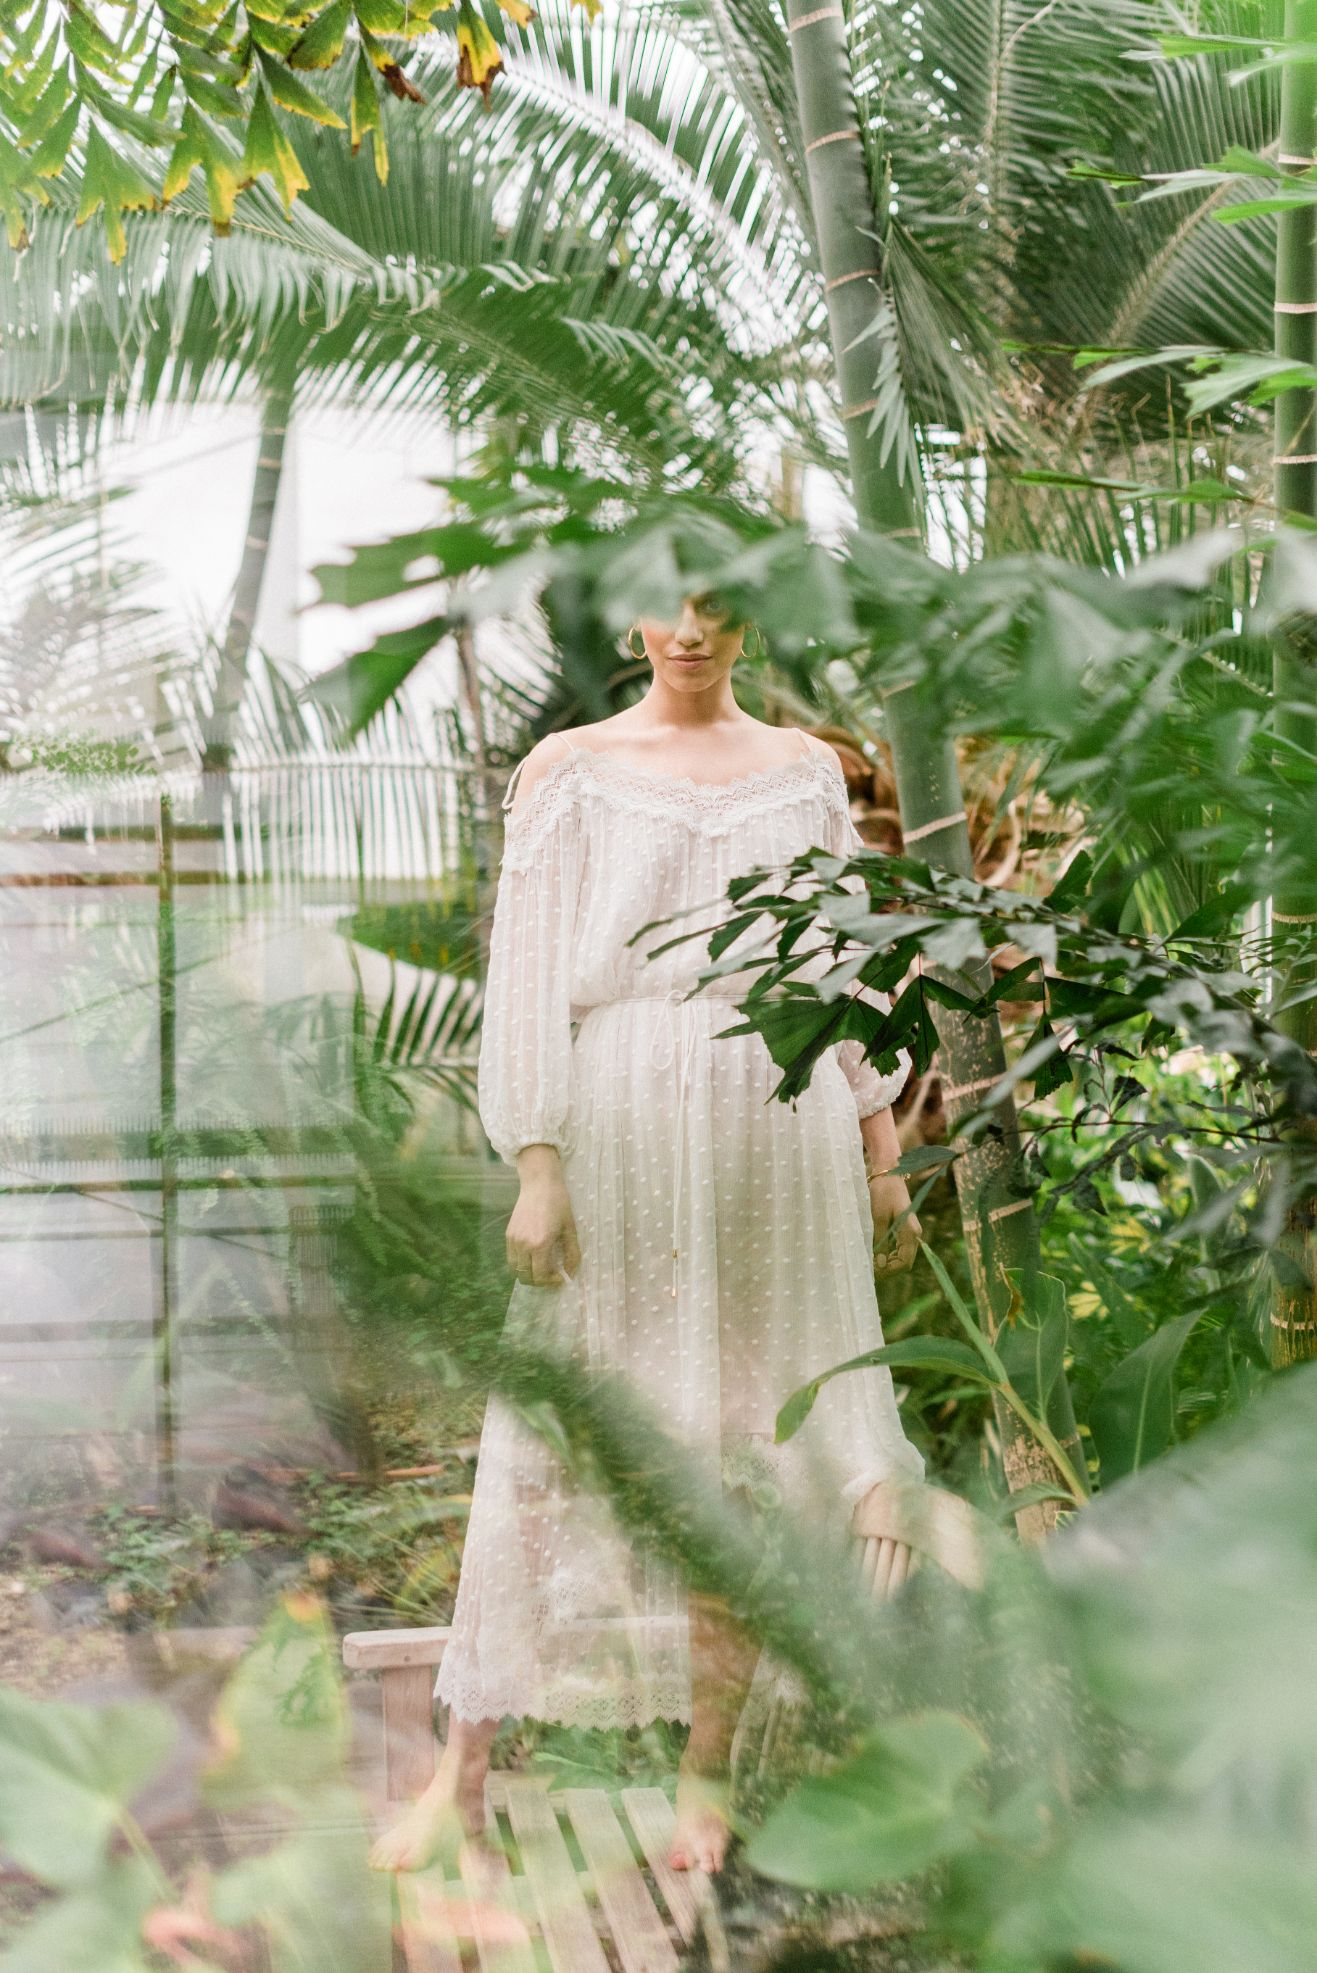 roger-williams-park-botanical-tropical-peach-daylynn-designs50.jpg